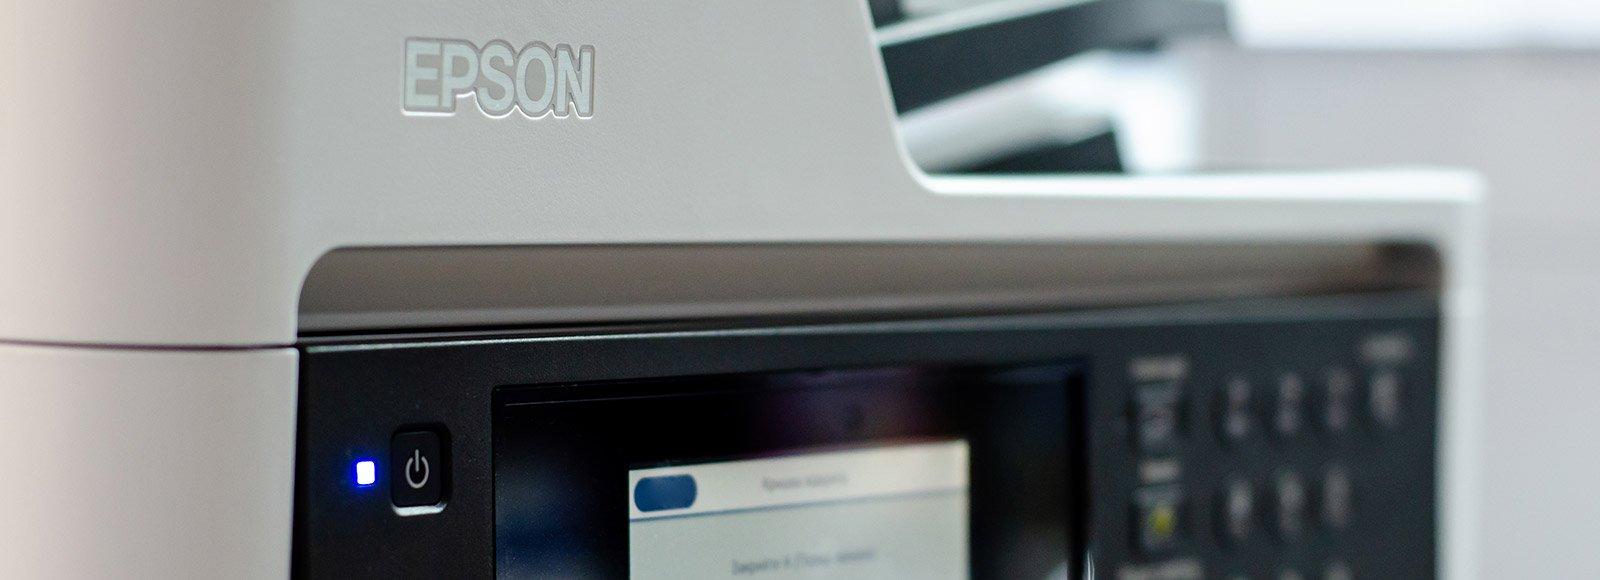 Noleggio stampanti Epson RIPS - NoleggioPC